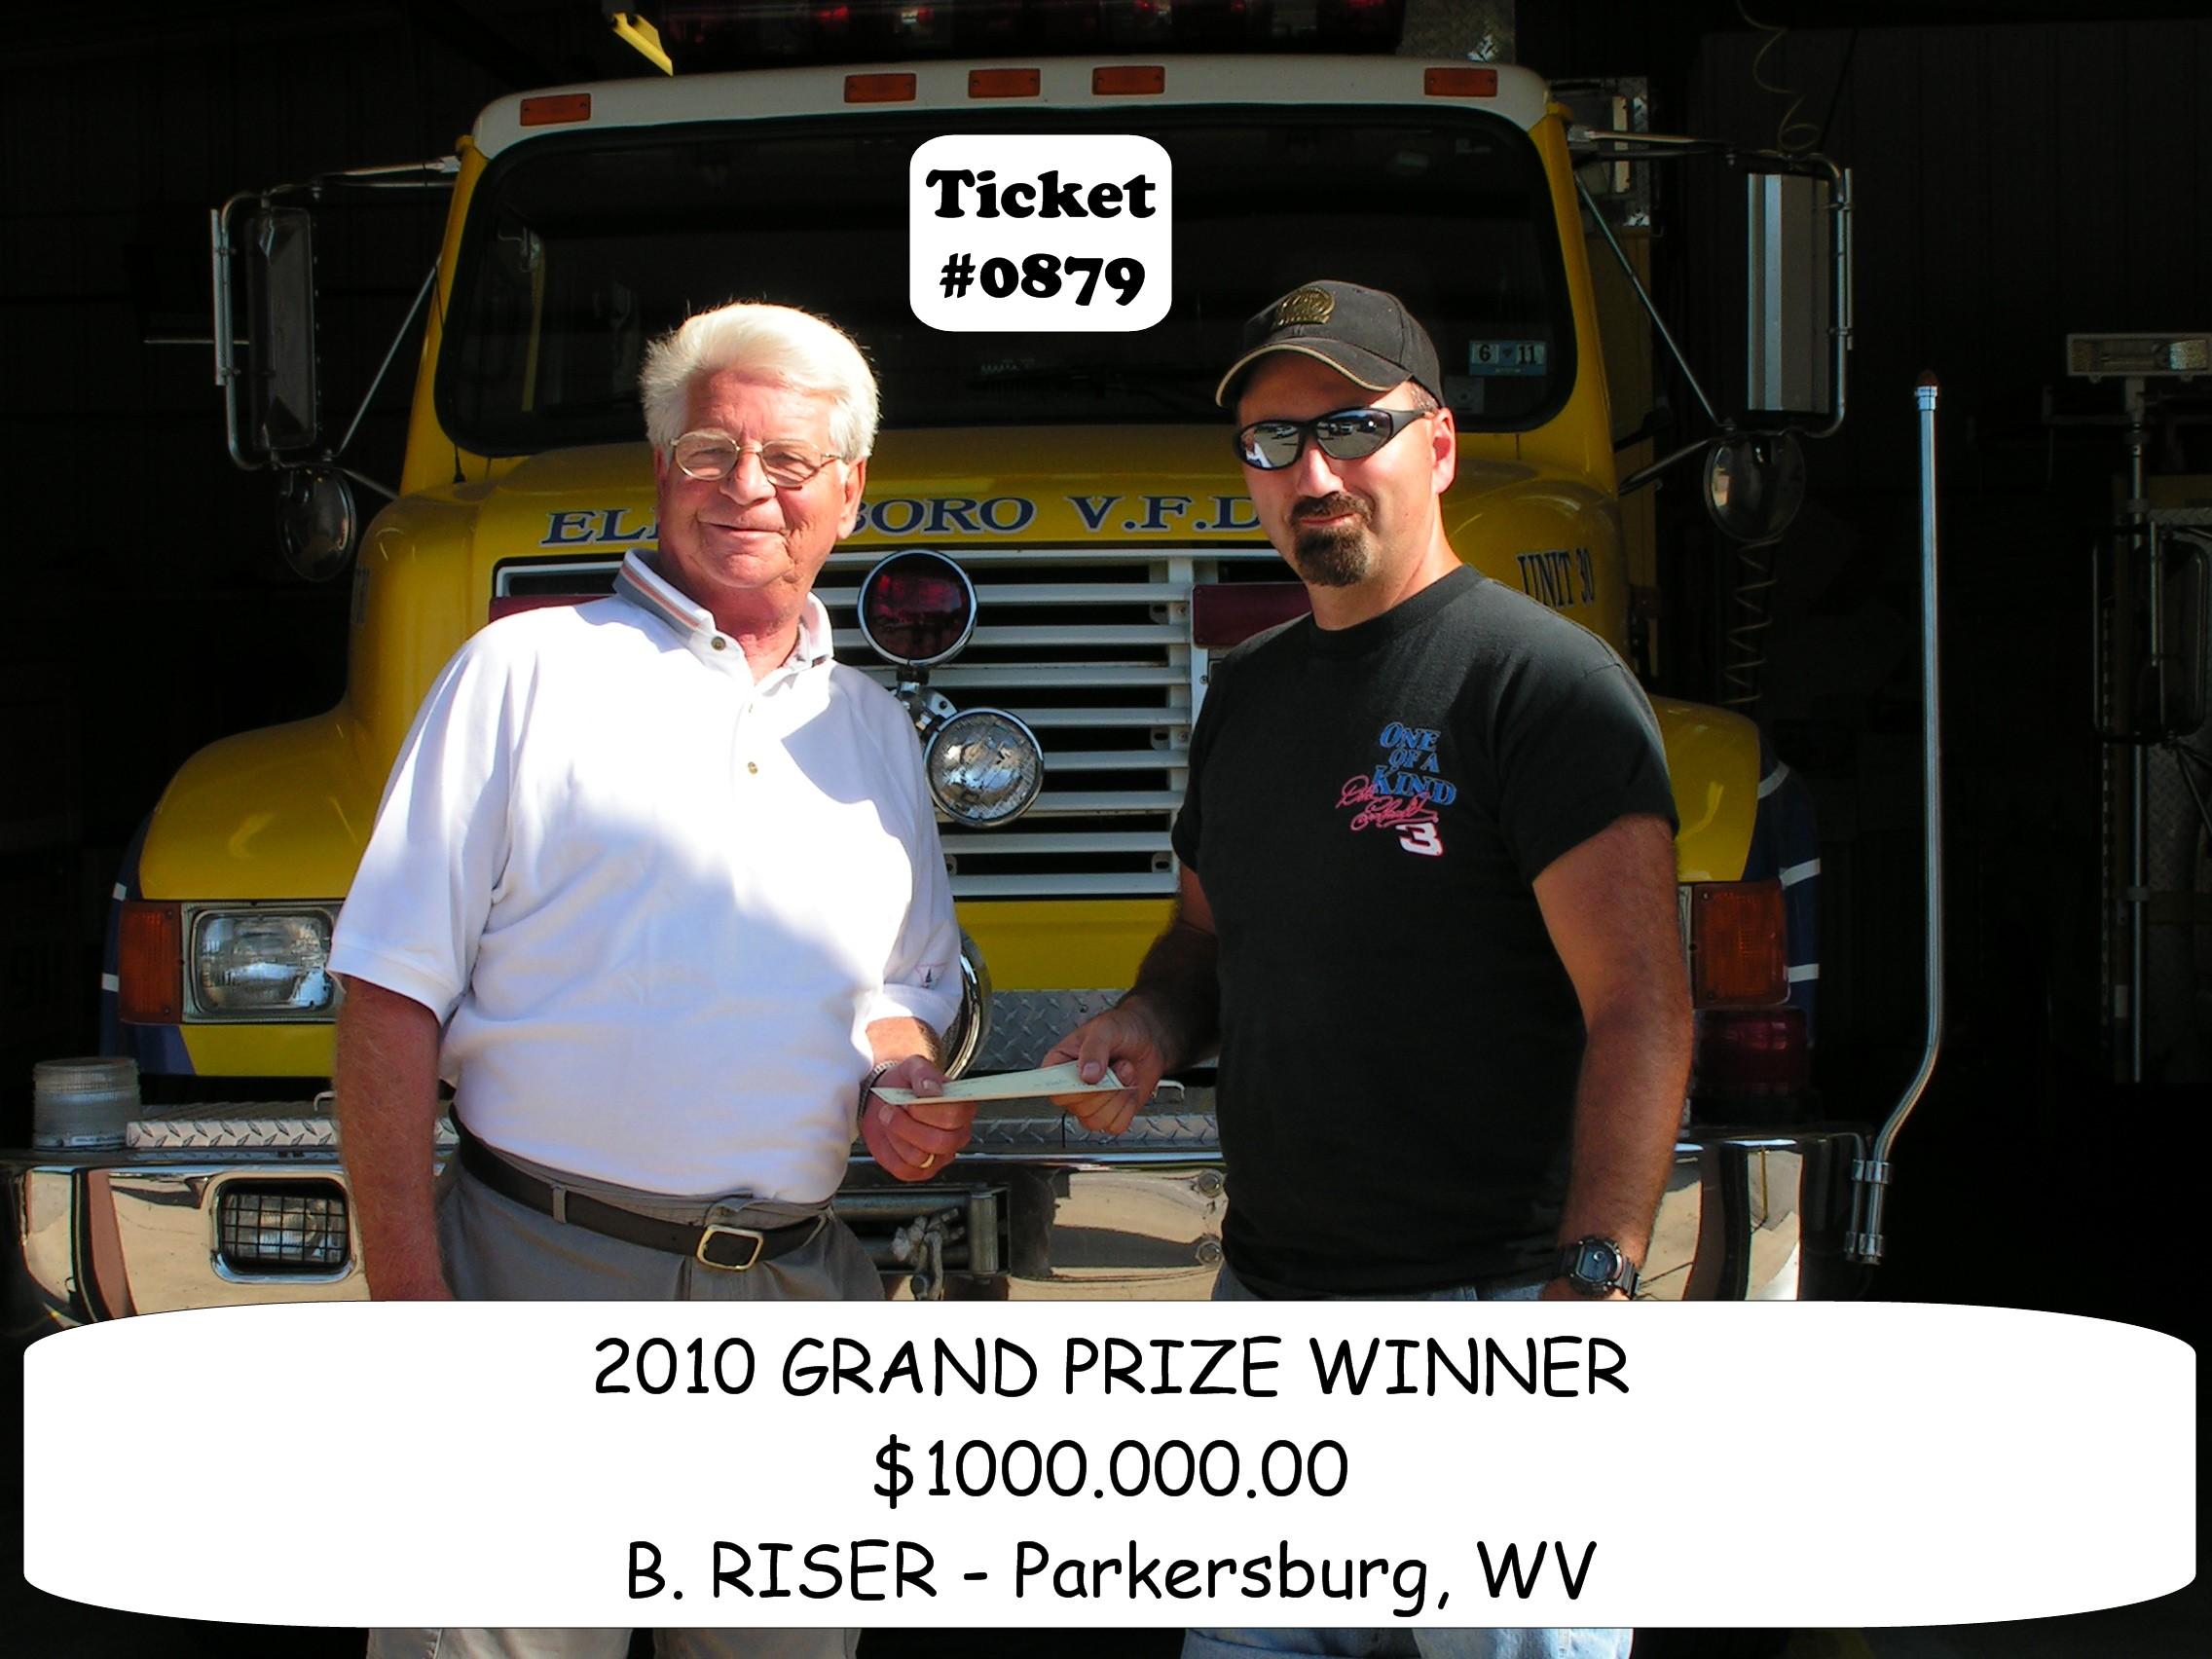 2010 Grand Prize Winner Bob Riser